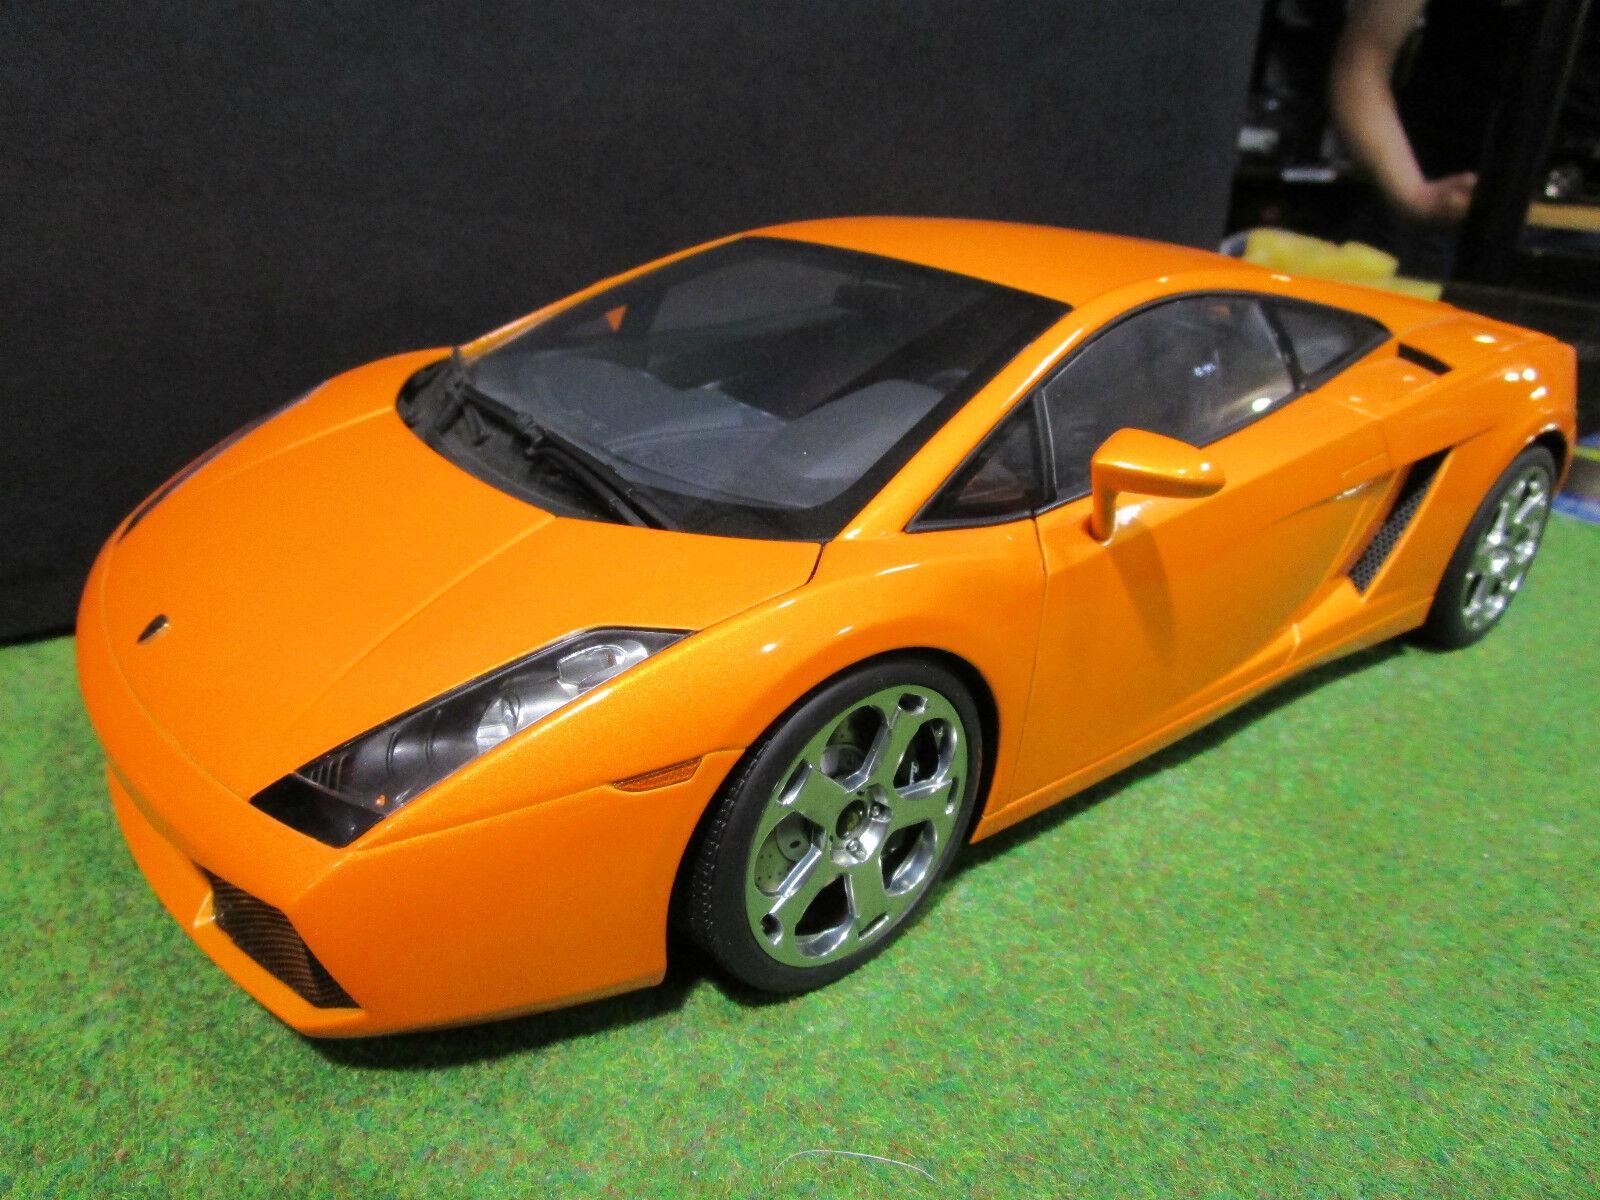 bajo precio del 40% LAMBORGHINI GALLARDO Naranja métal 1 12 AUTOART AUTOART AUTOART 12092 voiture miniature collectio  envío gratuito a nivel mundial